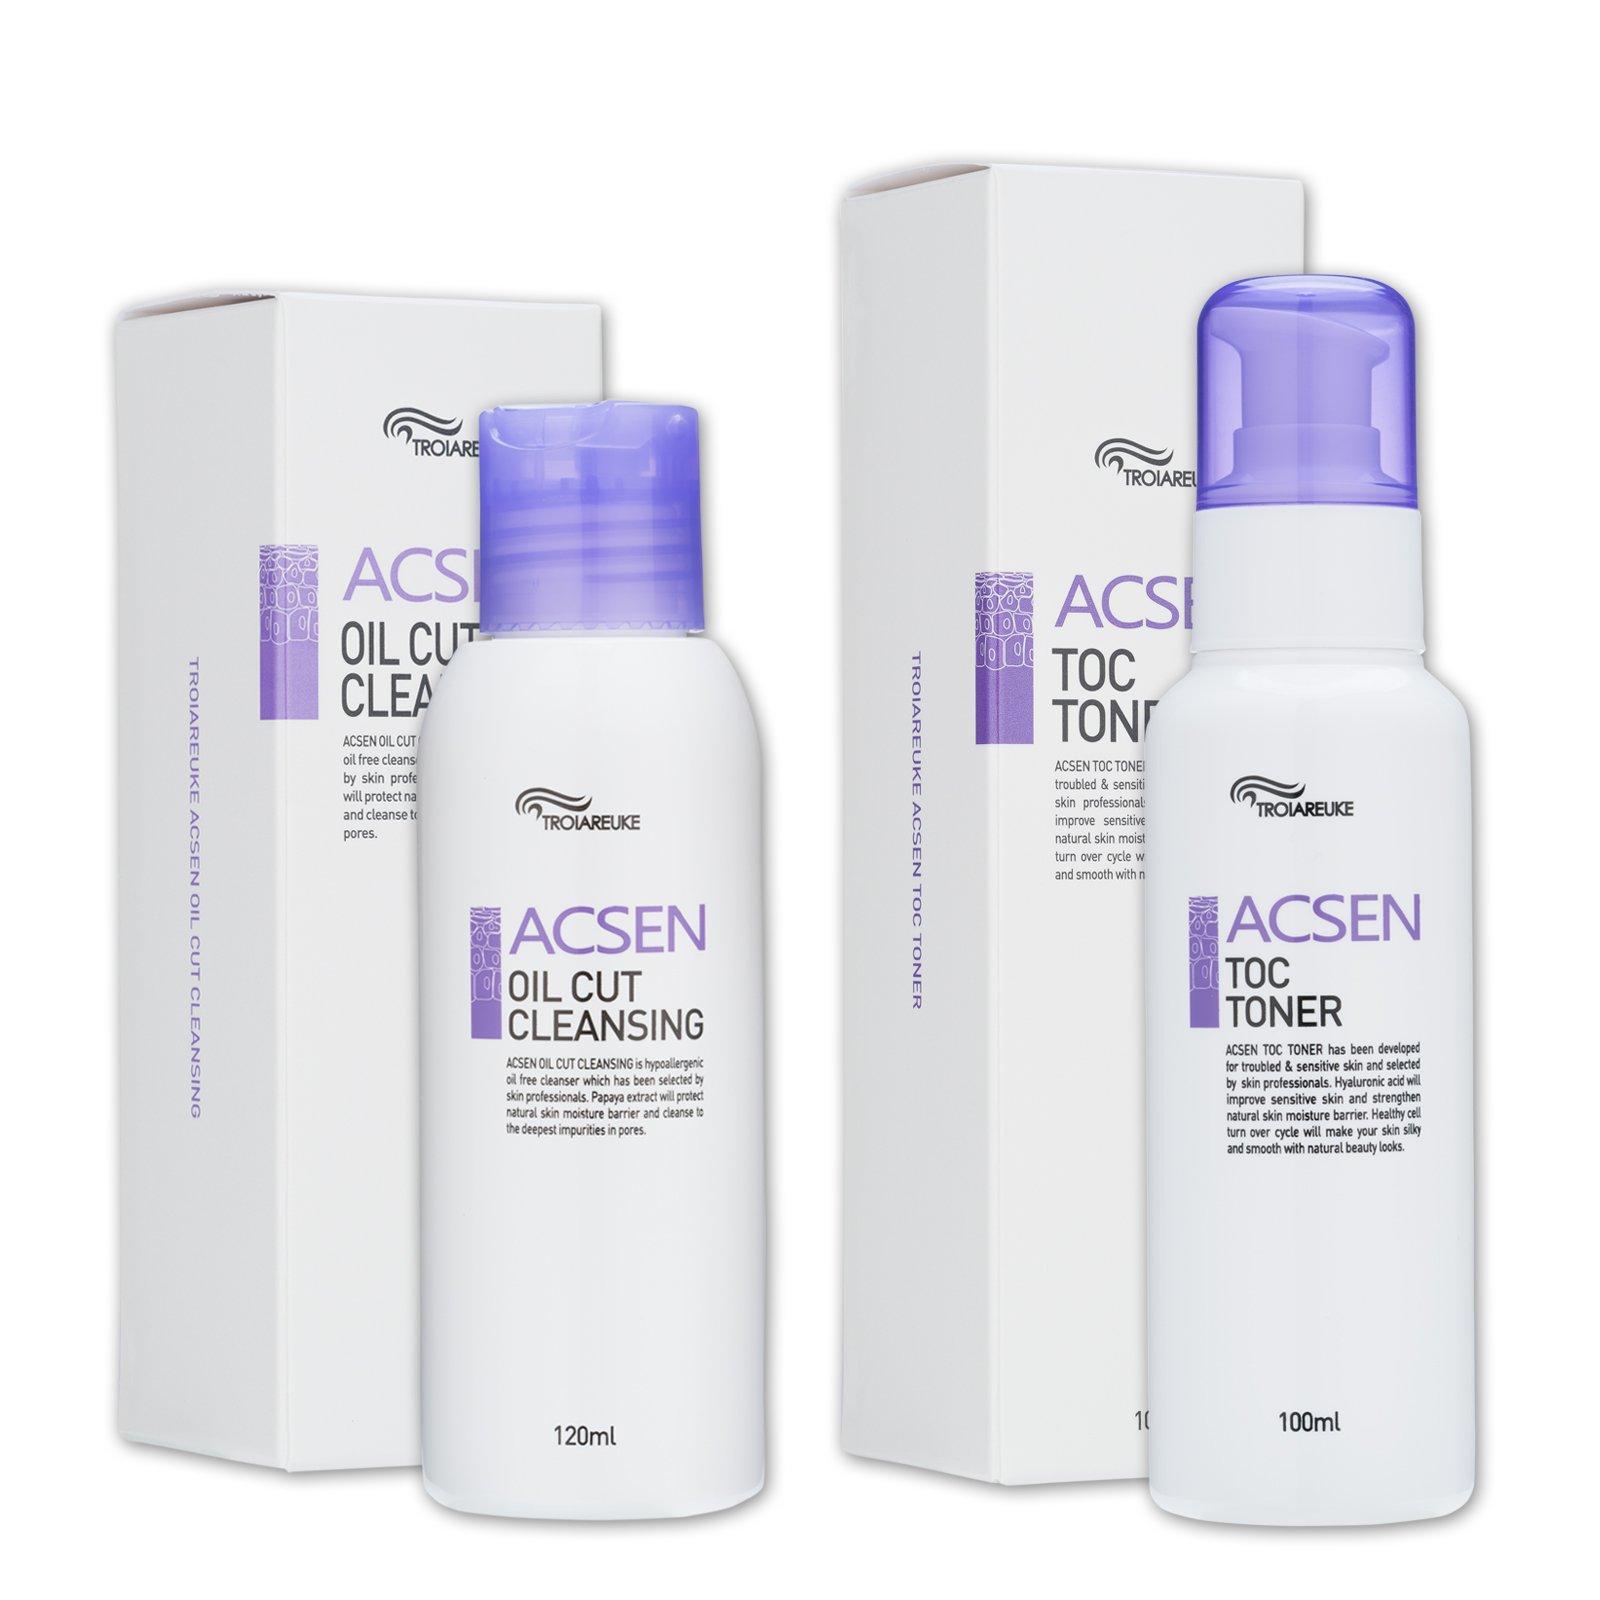 TROIAREUKE Oil Cut Cleansing 4.05 Ounce + ACSEN TOC Toner 3.38 Ounce Set, Skincare Treatment for Acne Trouble Sensitive Skin